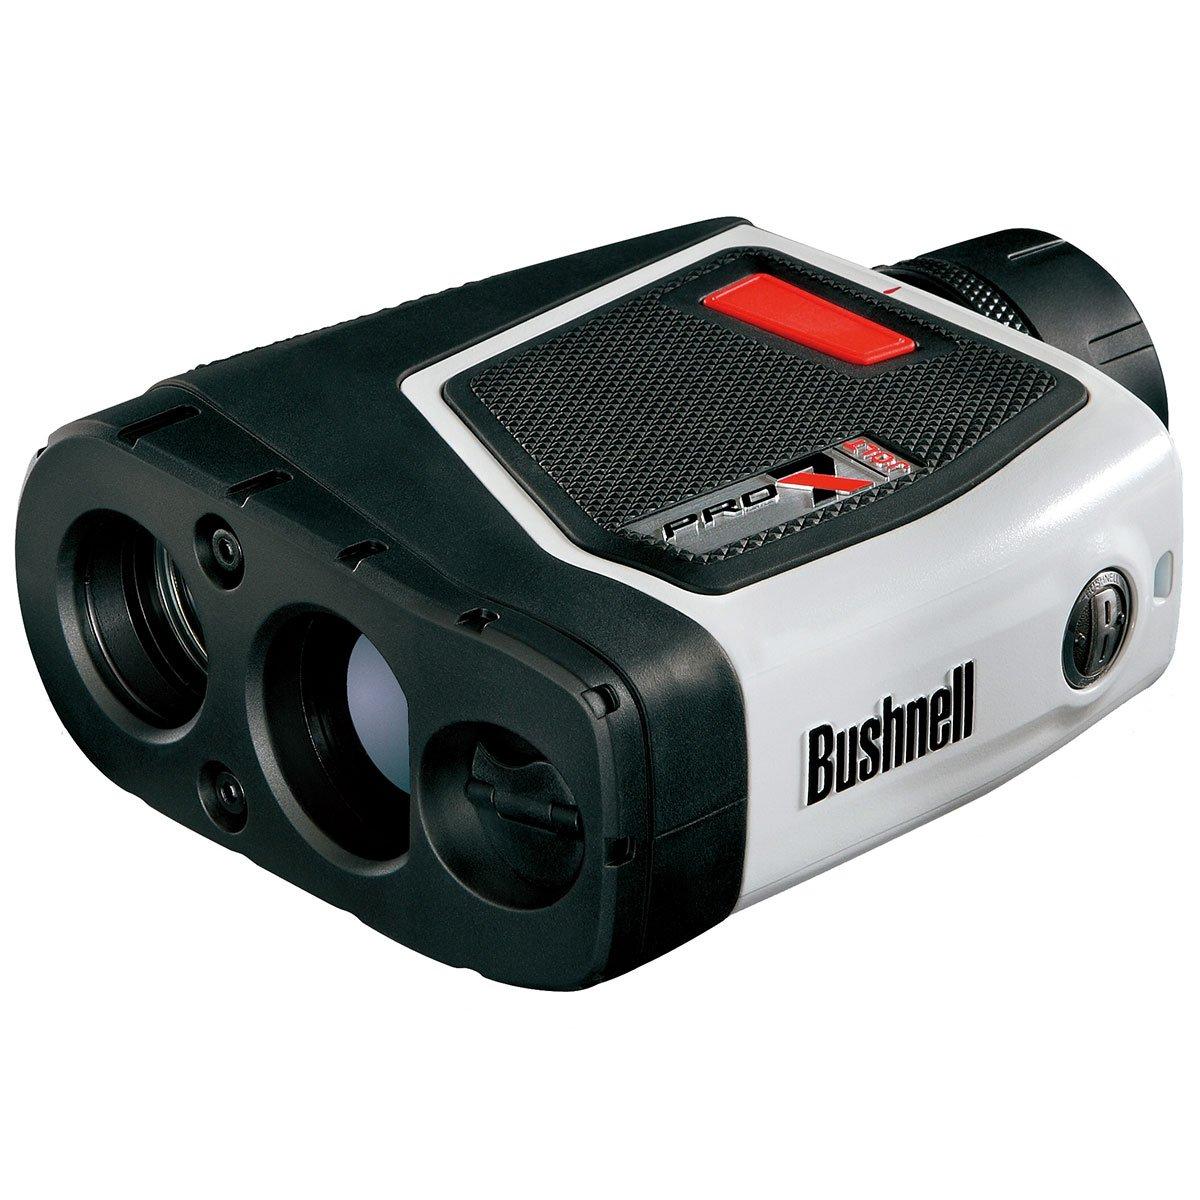 Bushnell(ブッシュネル) ピンシーカー ピンシーカーTEプロX7ジョルト 182182   B00K14C43Q